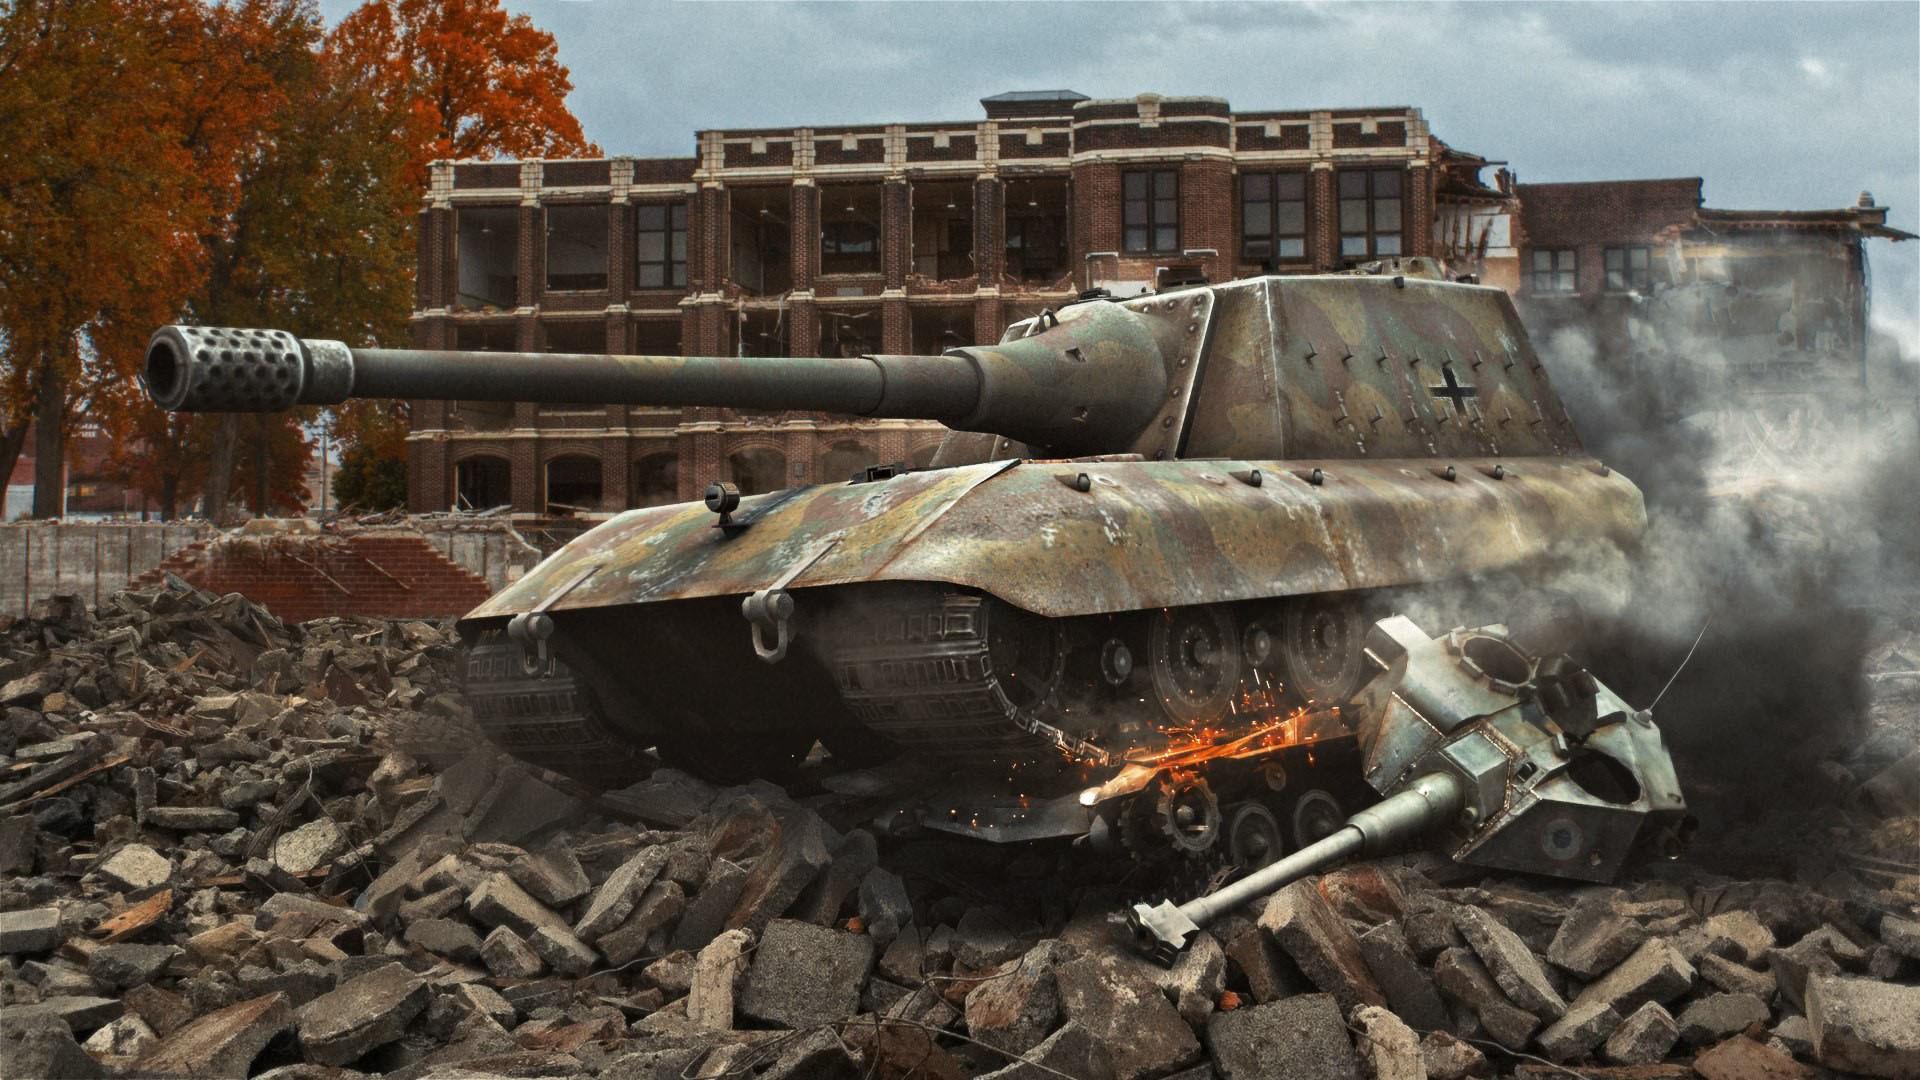 World of Tanks – Destroyed City wallpaper